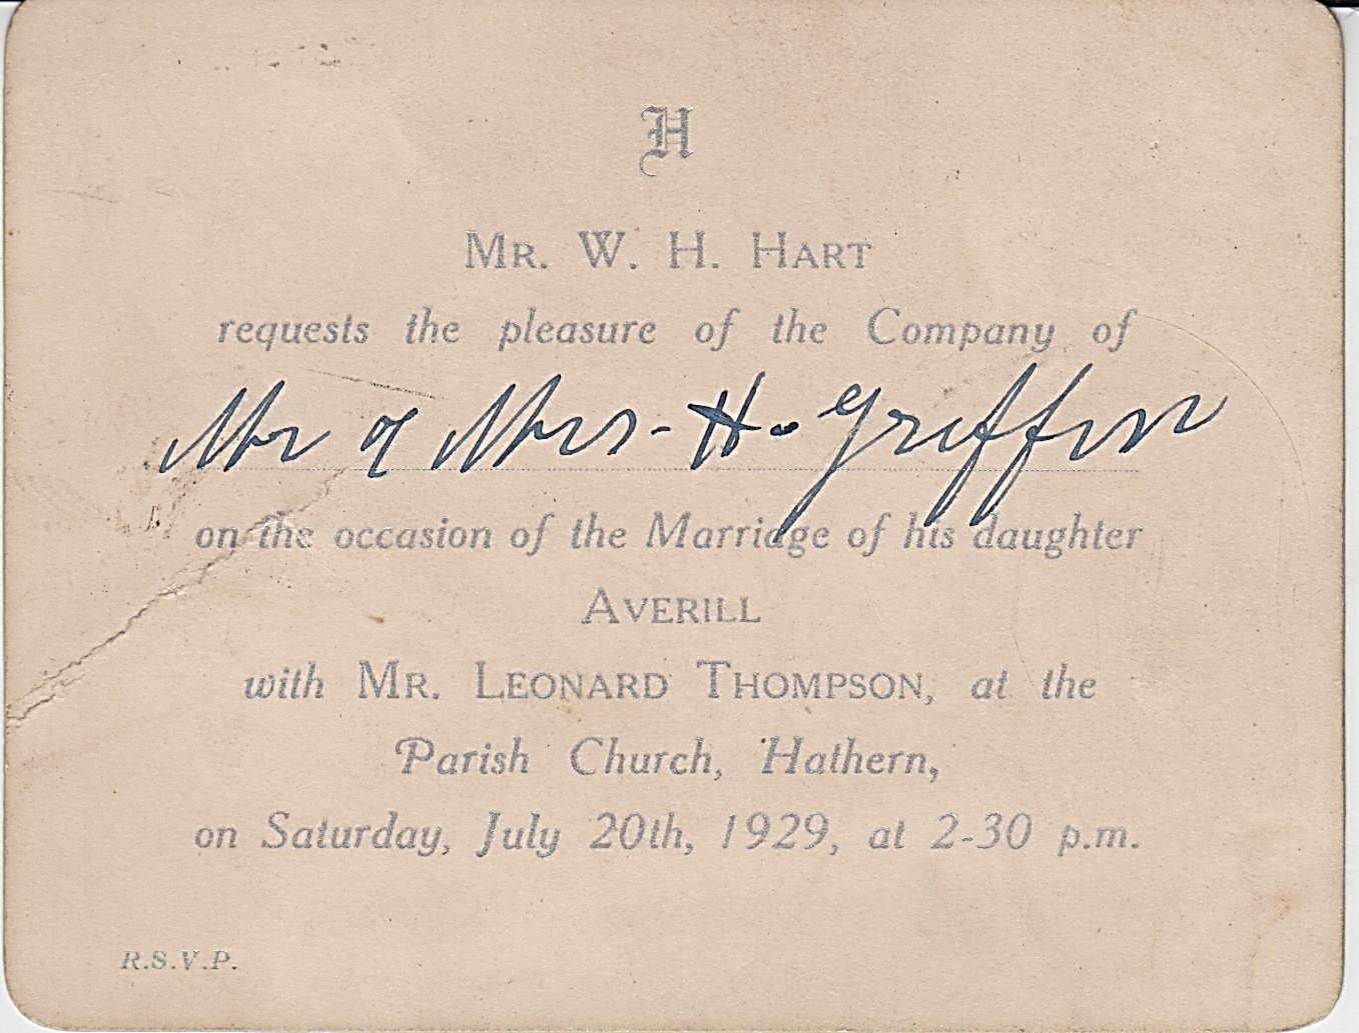 wedding_invite_form_w_hart_001.jpg